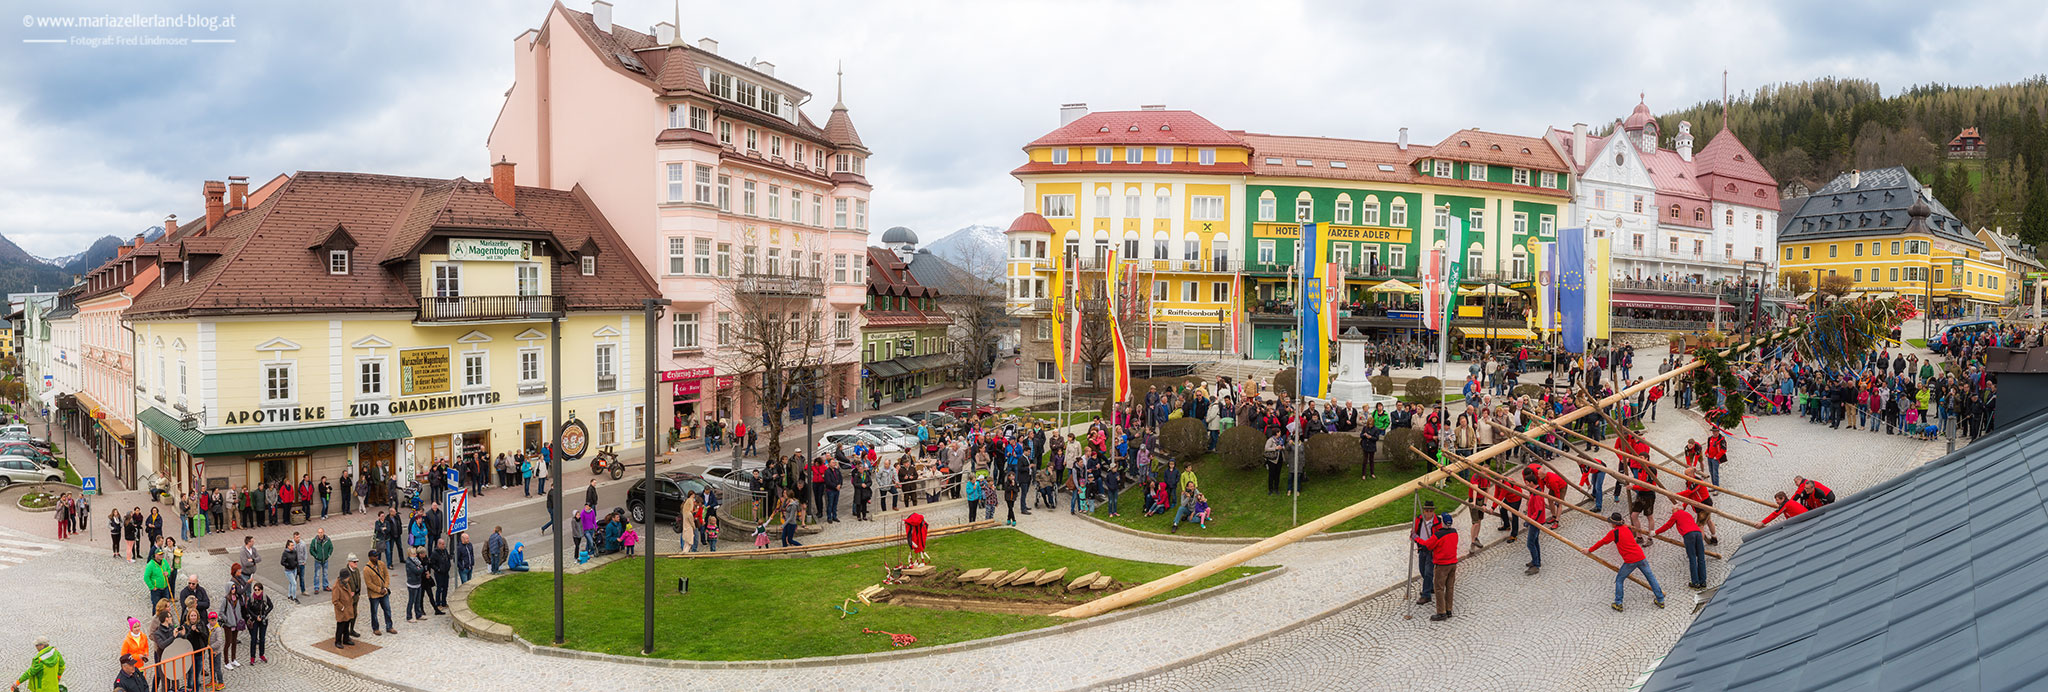 Maibaumaufstellen-Mariazell-Bergrettung-Stadtkapelle-2015-IMG_9271-Panorama